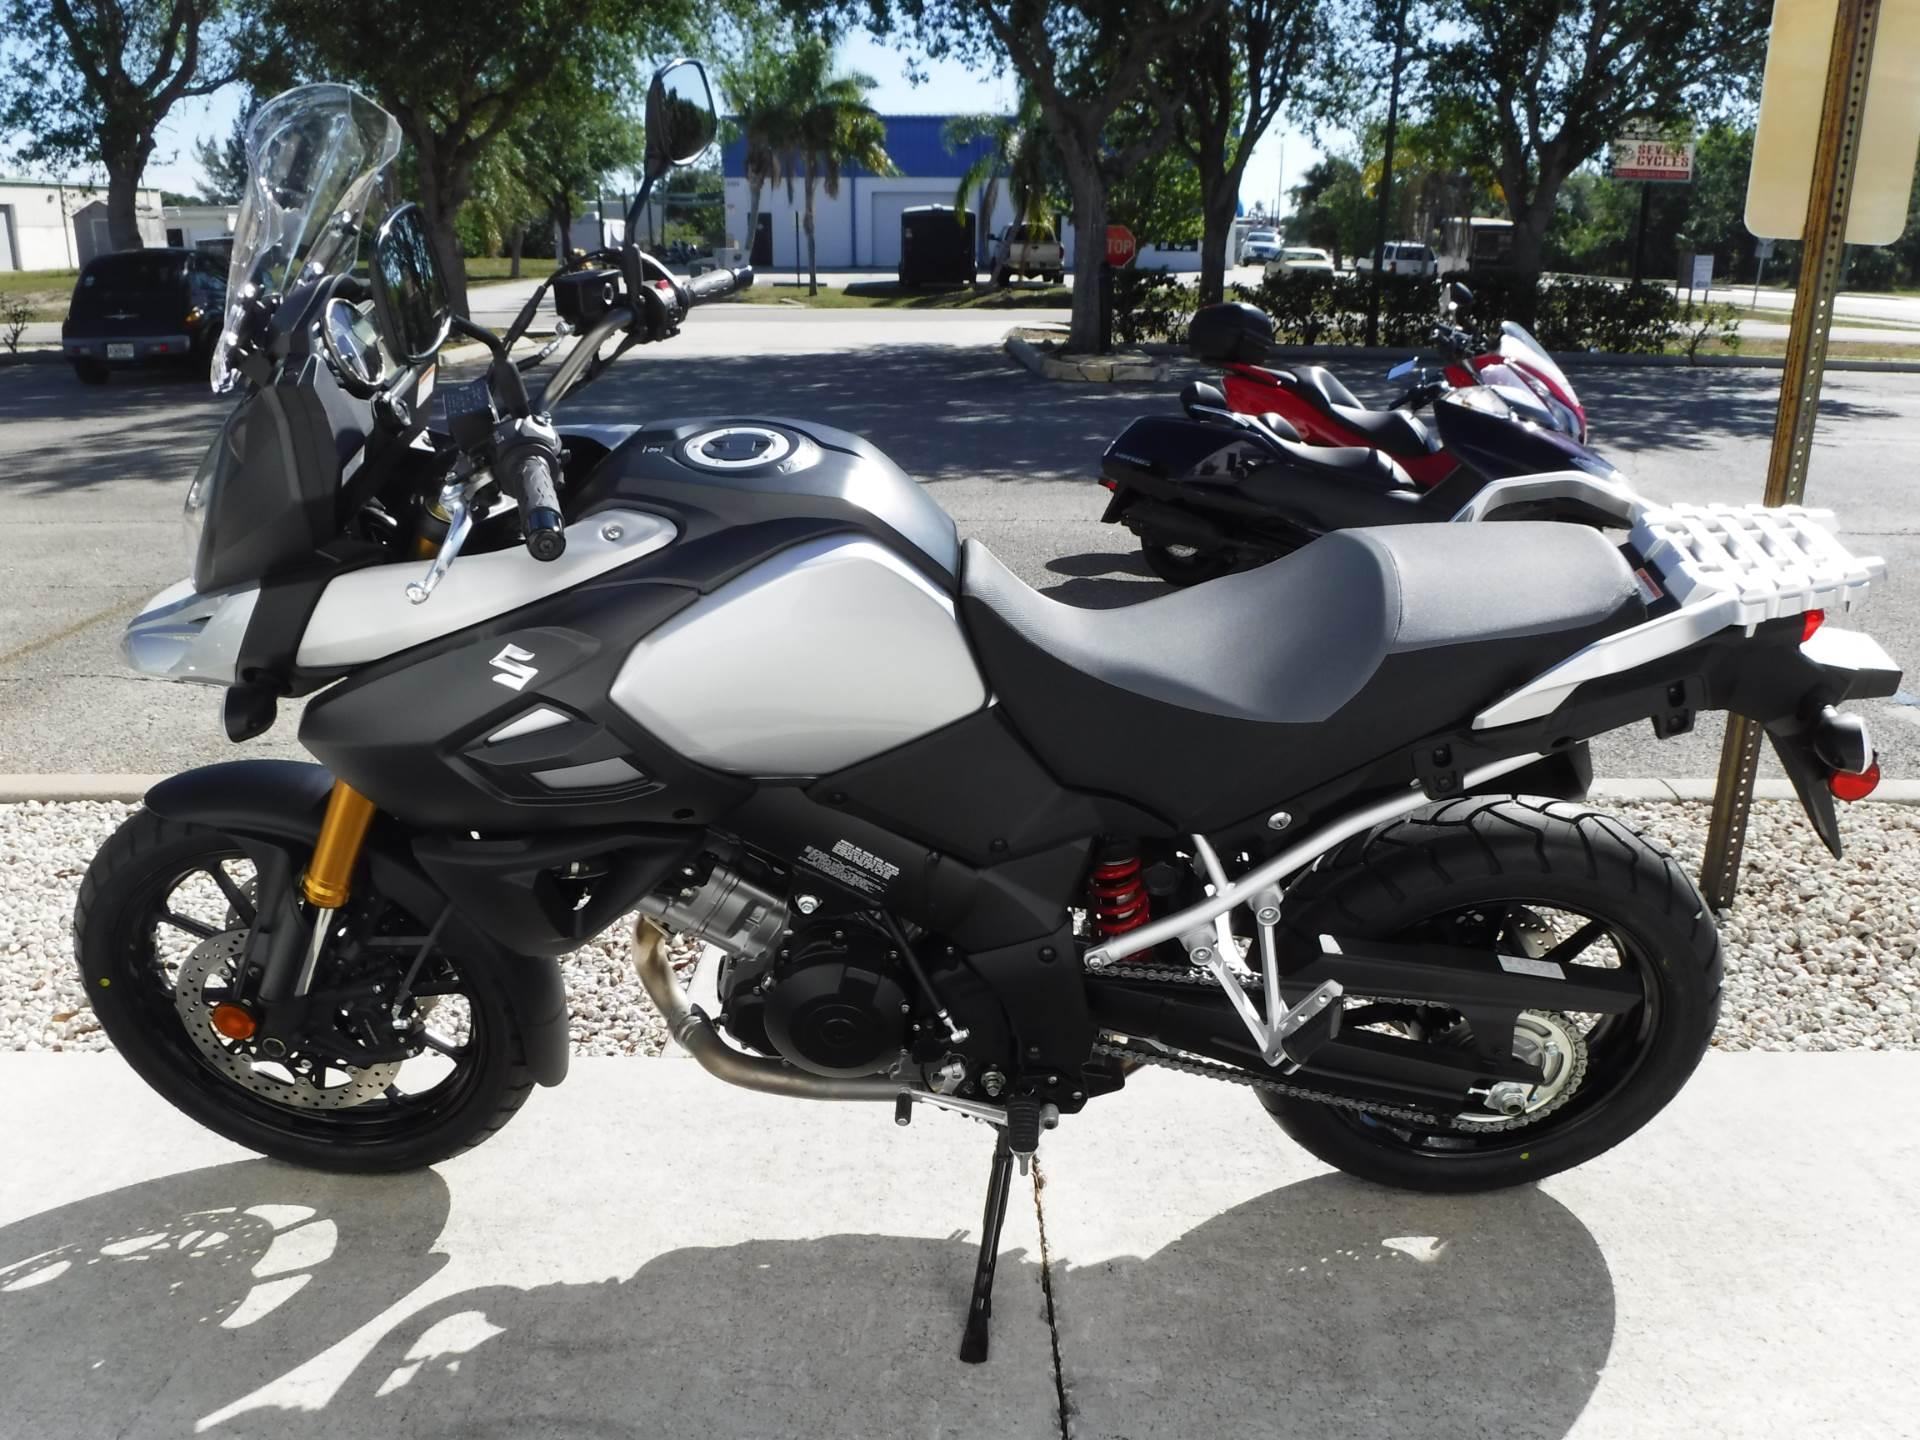 2016 Suzuki V-Strom 1000 ABS in Stuart, Florida